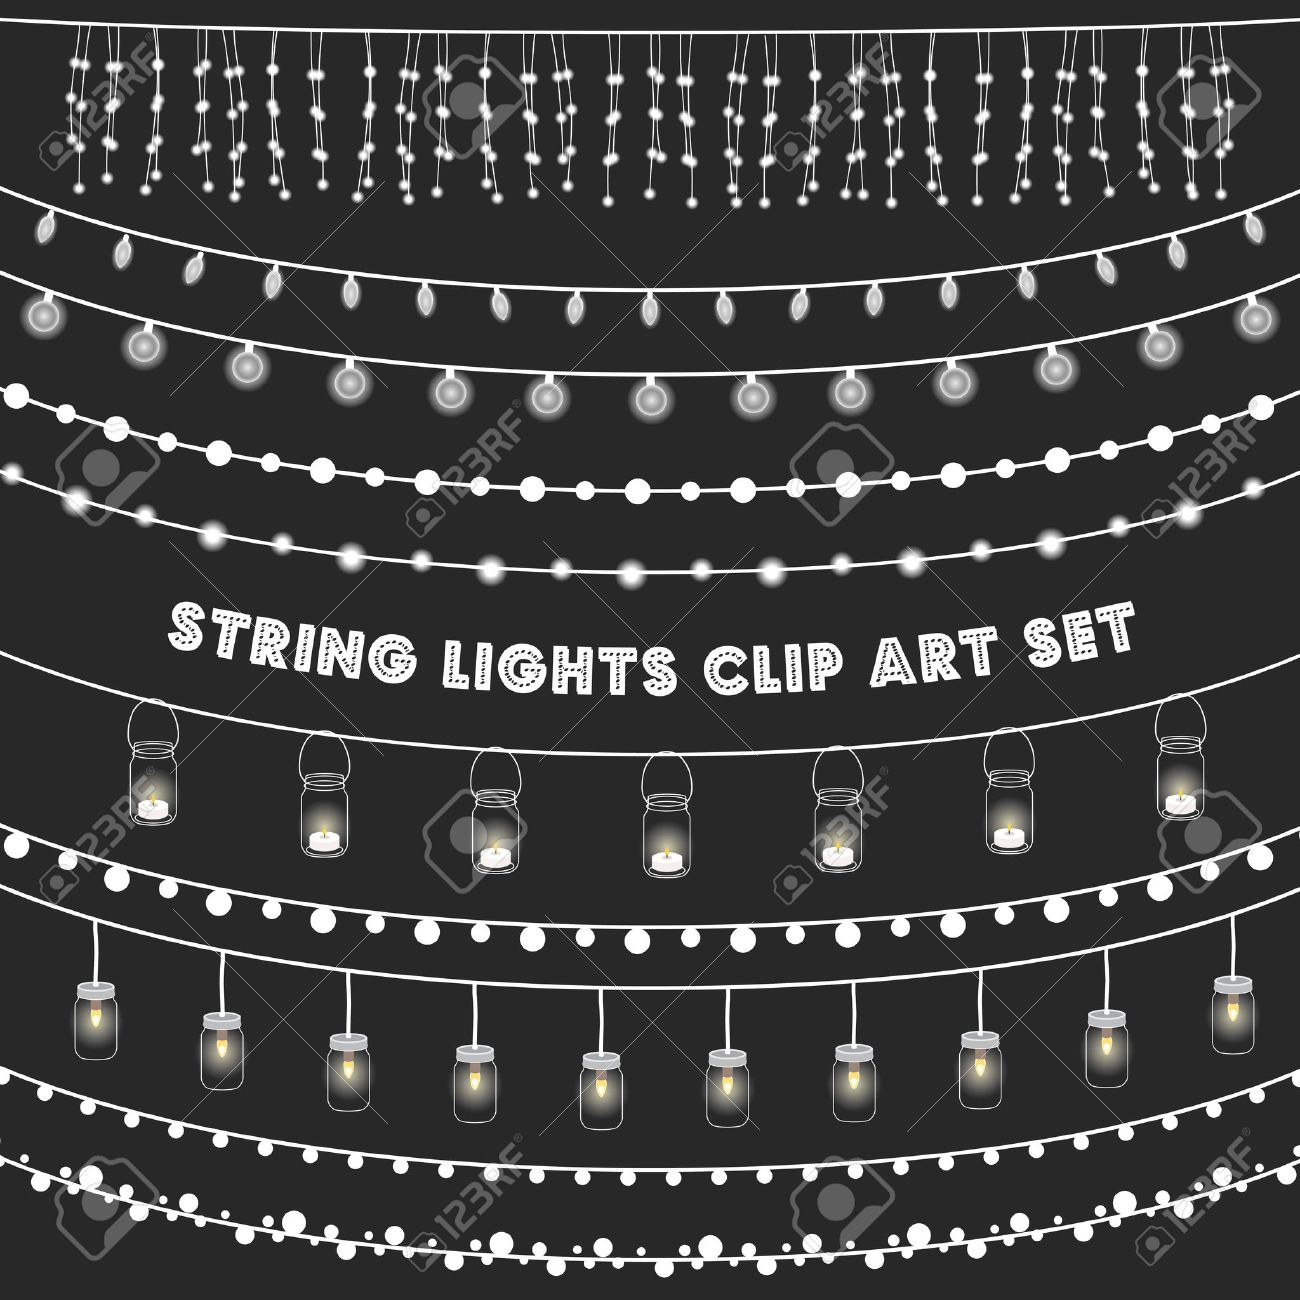 Chalkboard String Lights Set - Set of glowing string lights on a chalkboard grey background - 56933579